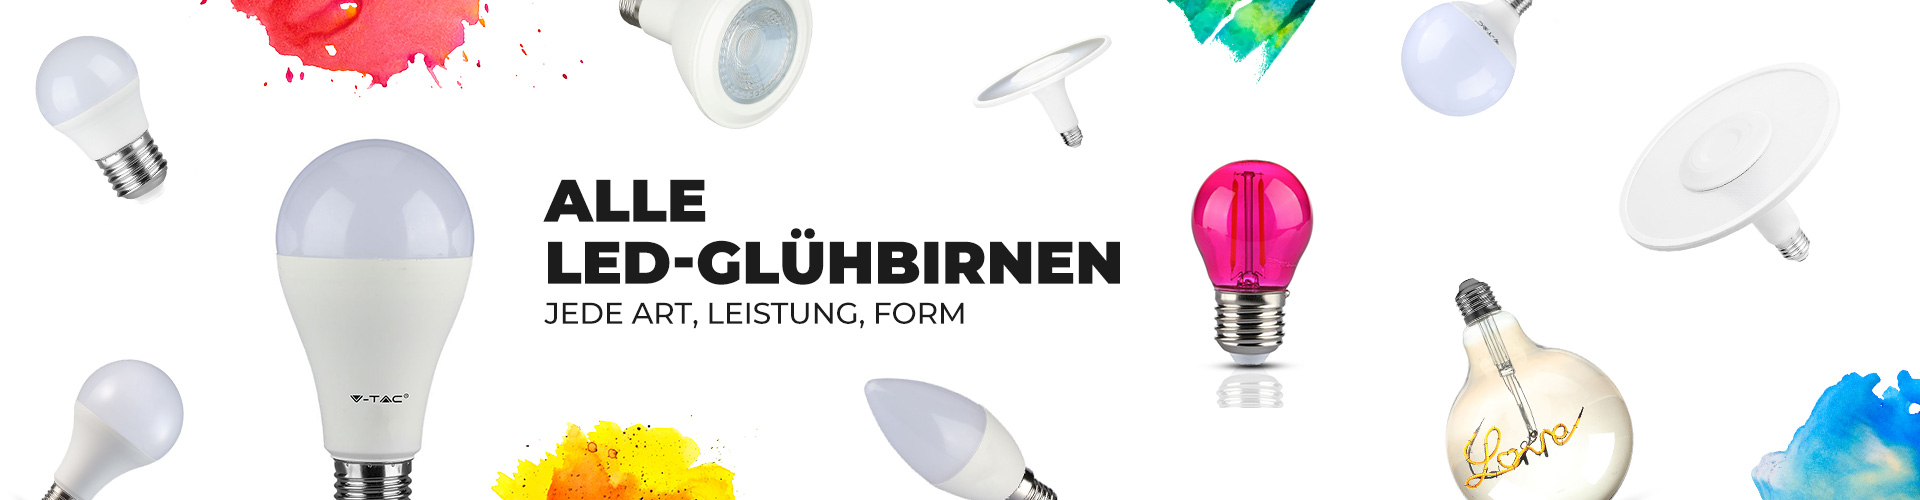 2-all-bulbs-at